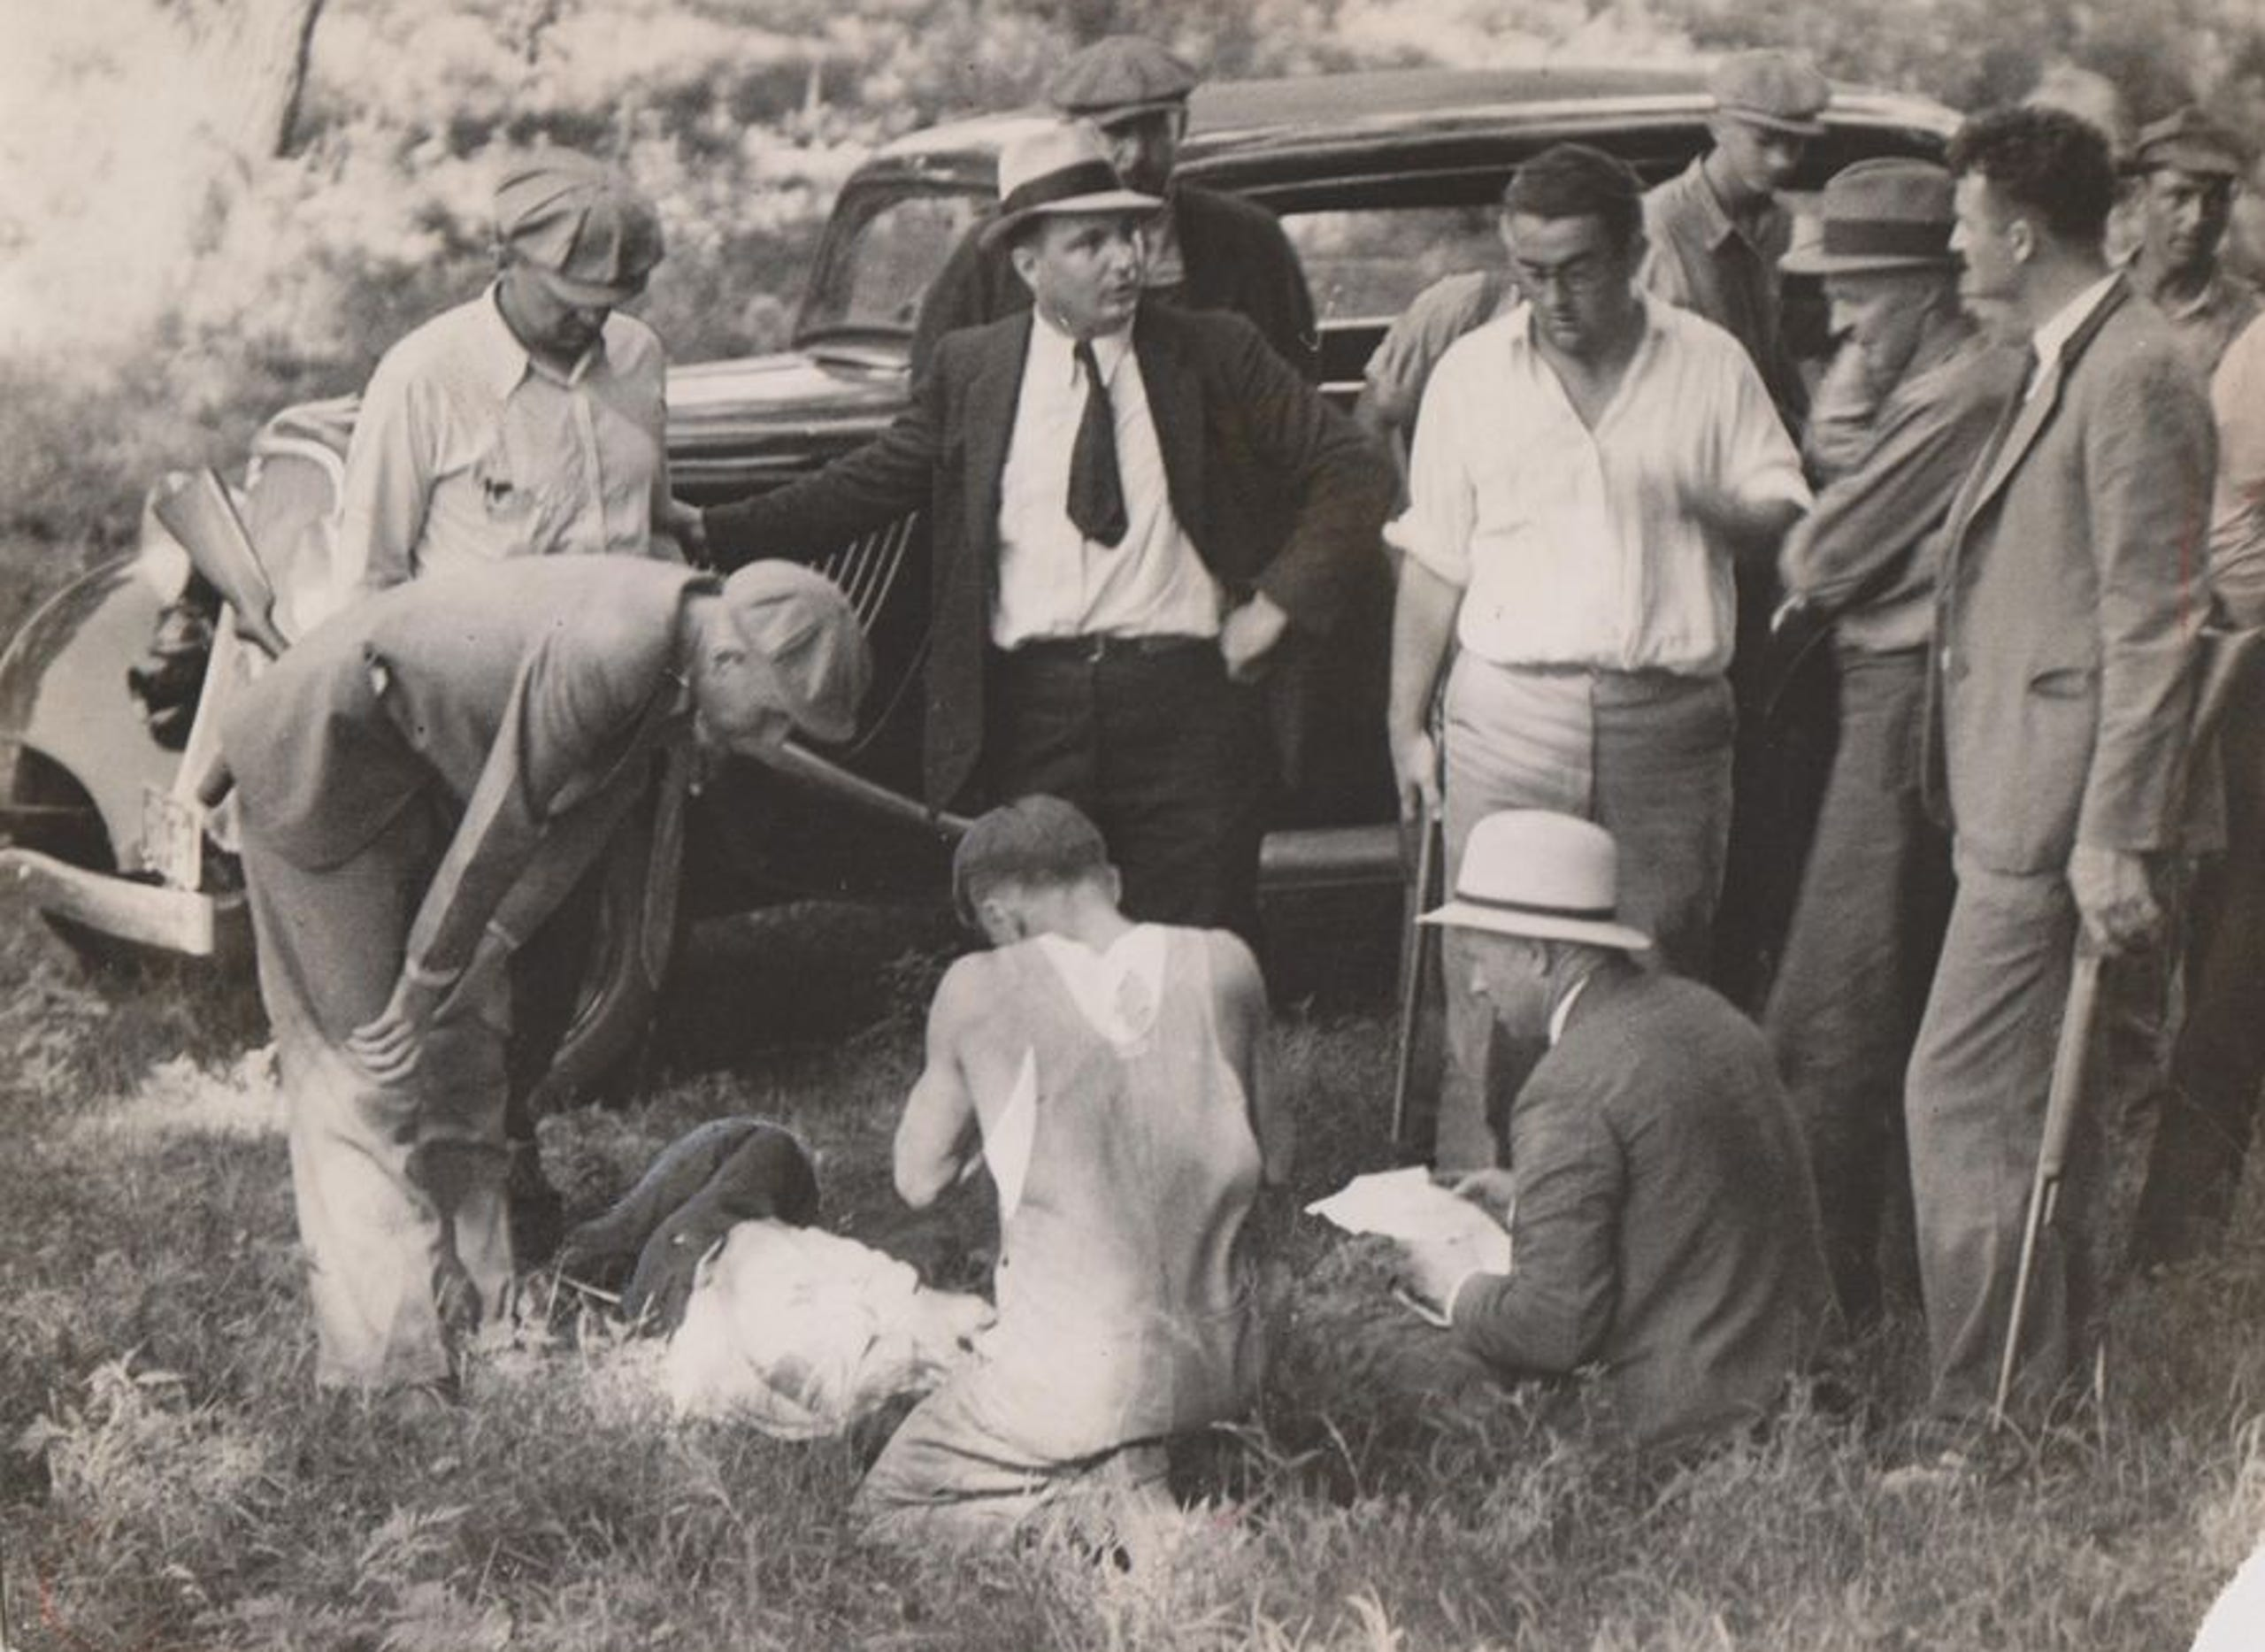 Bonnie and Clyde's notorious gang had a shootout near Dexter, Iowa